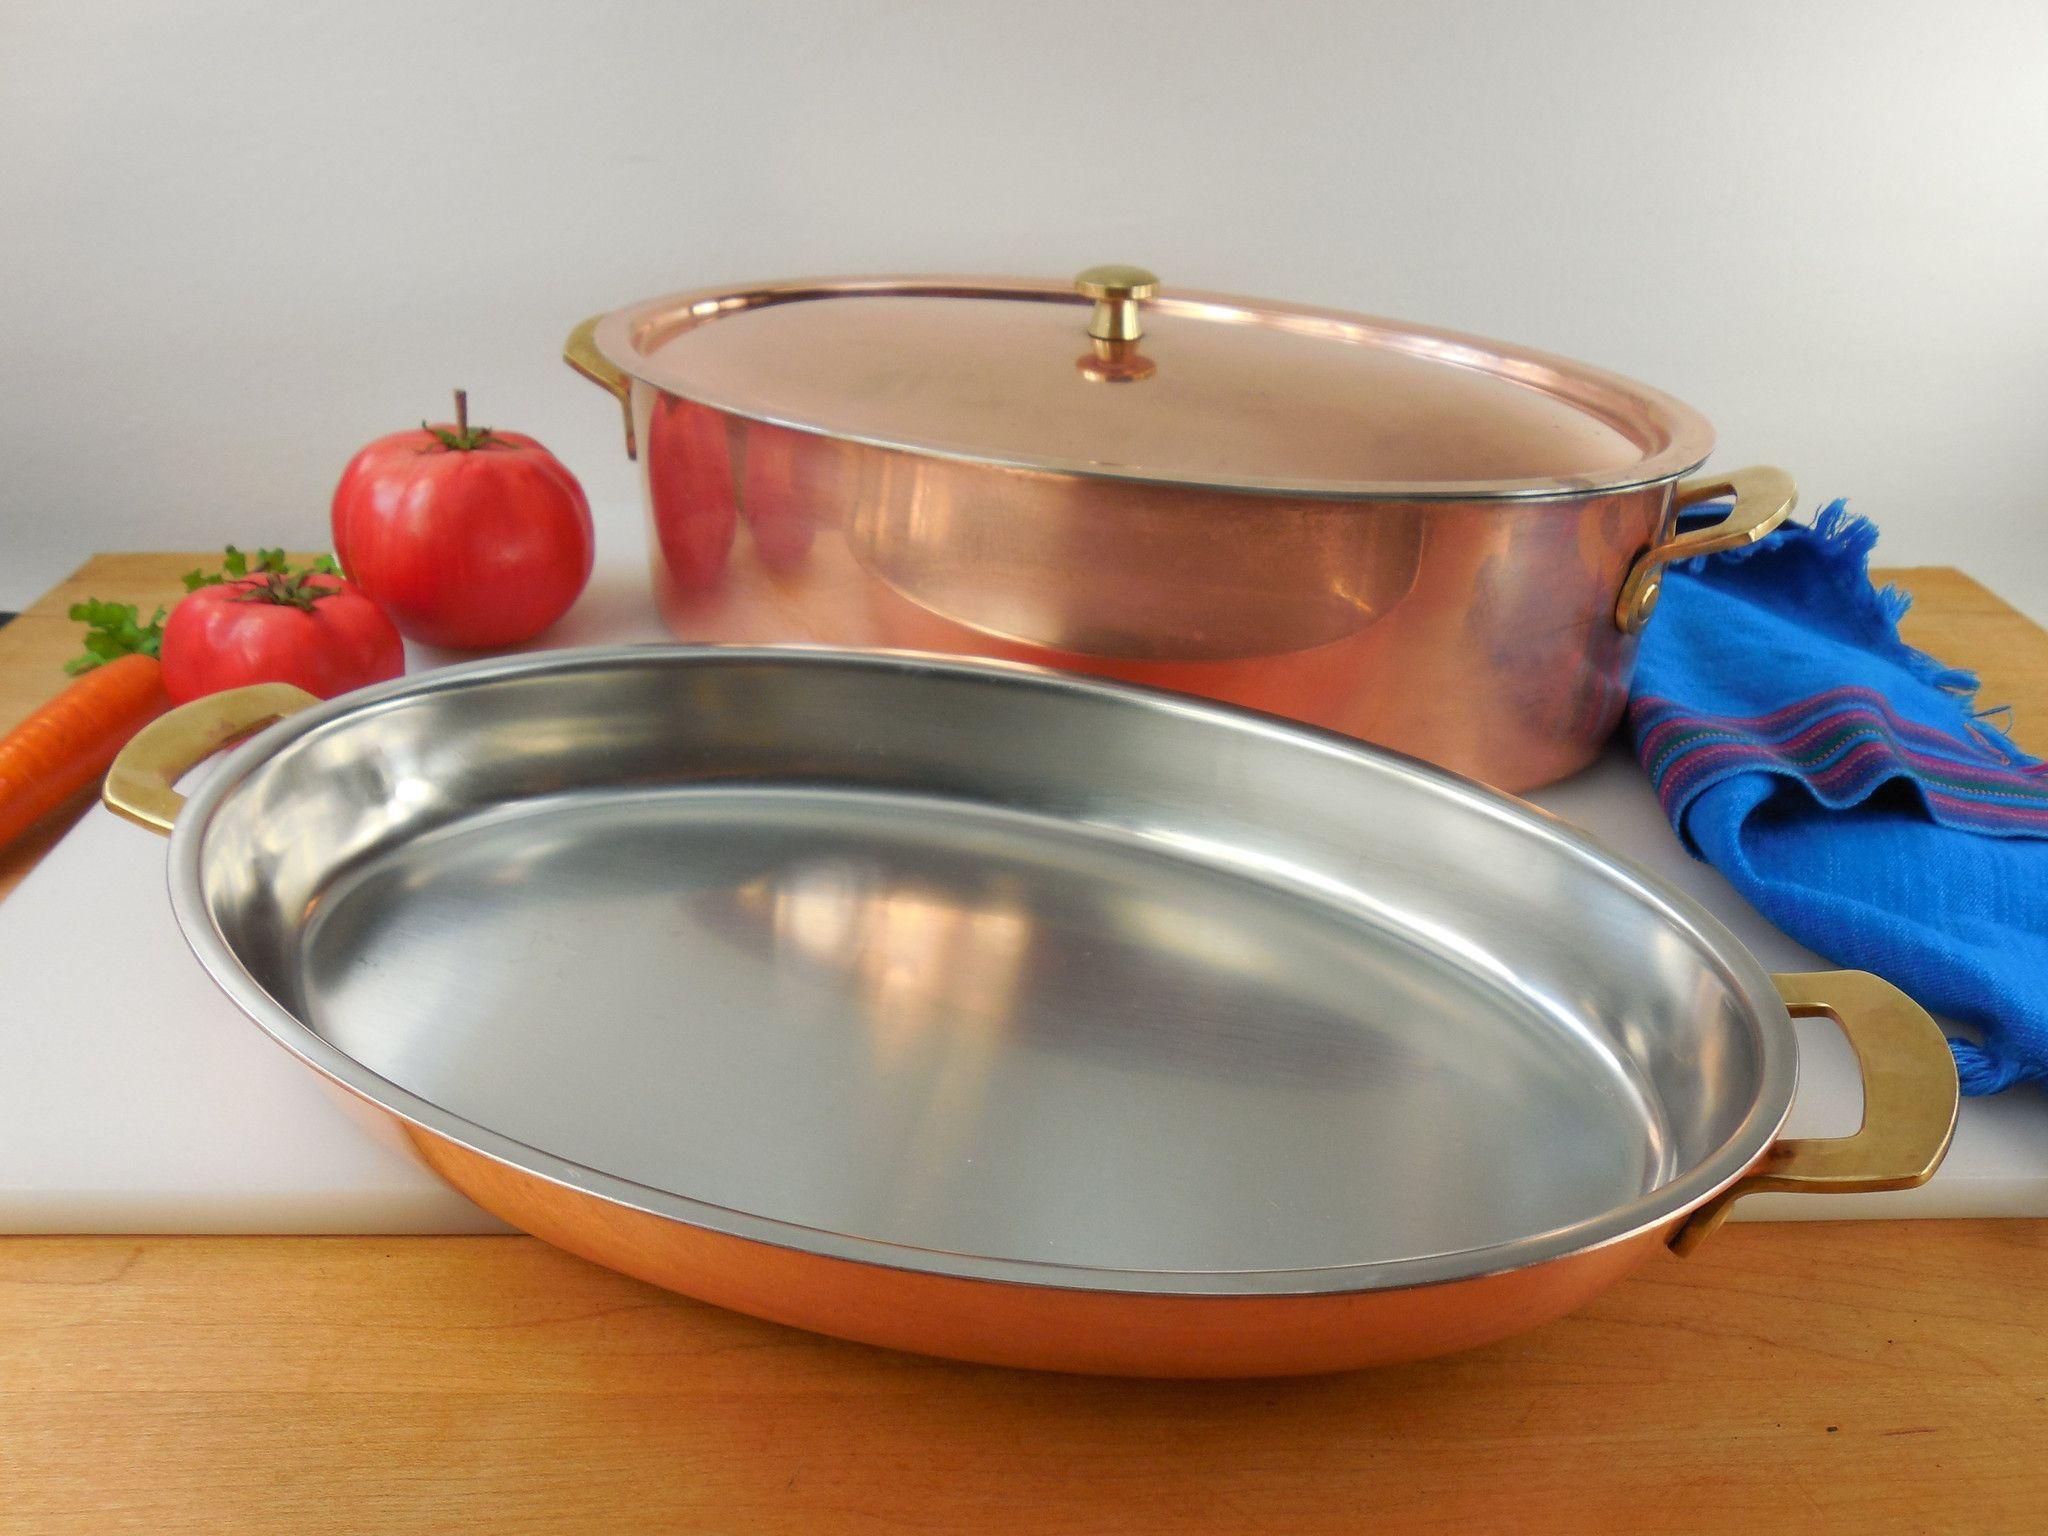 SOLD... Spring Culinox Switzerland Copper Brass Stainless Cookware ...